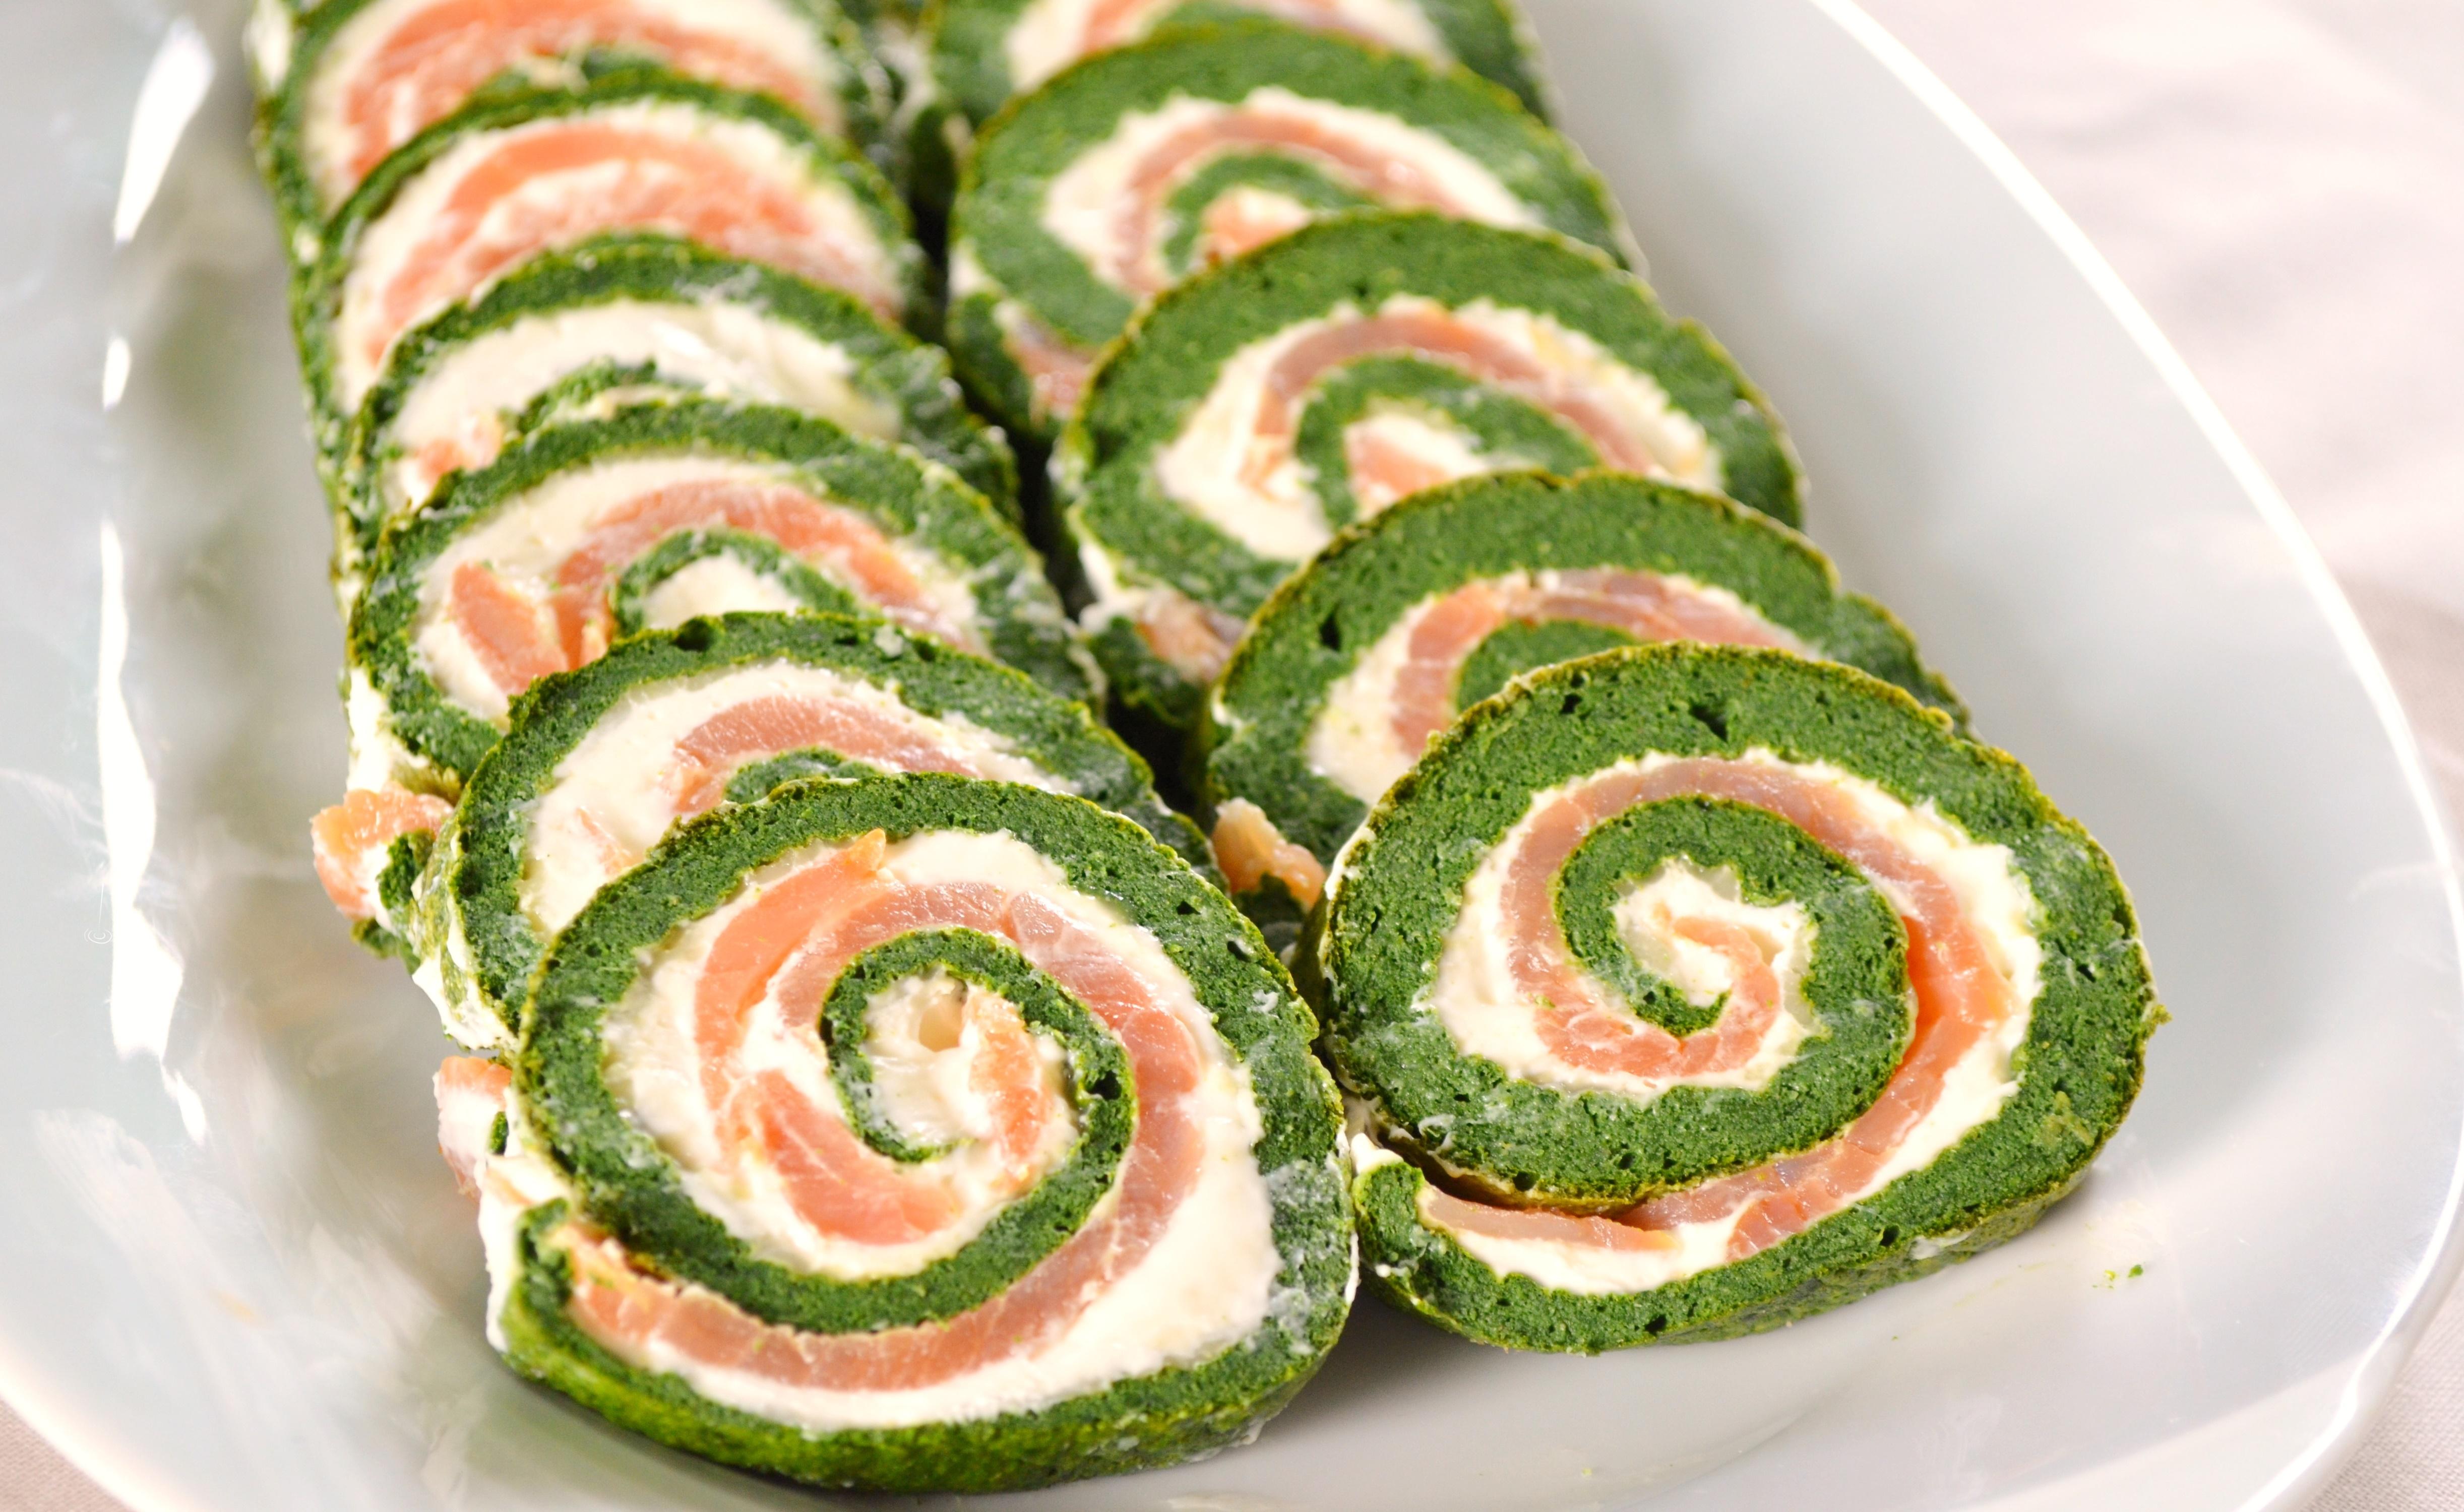 Recetas con espinacas mil recetas for Espinacas como cocinarlas